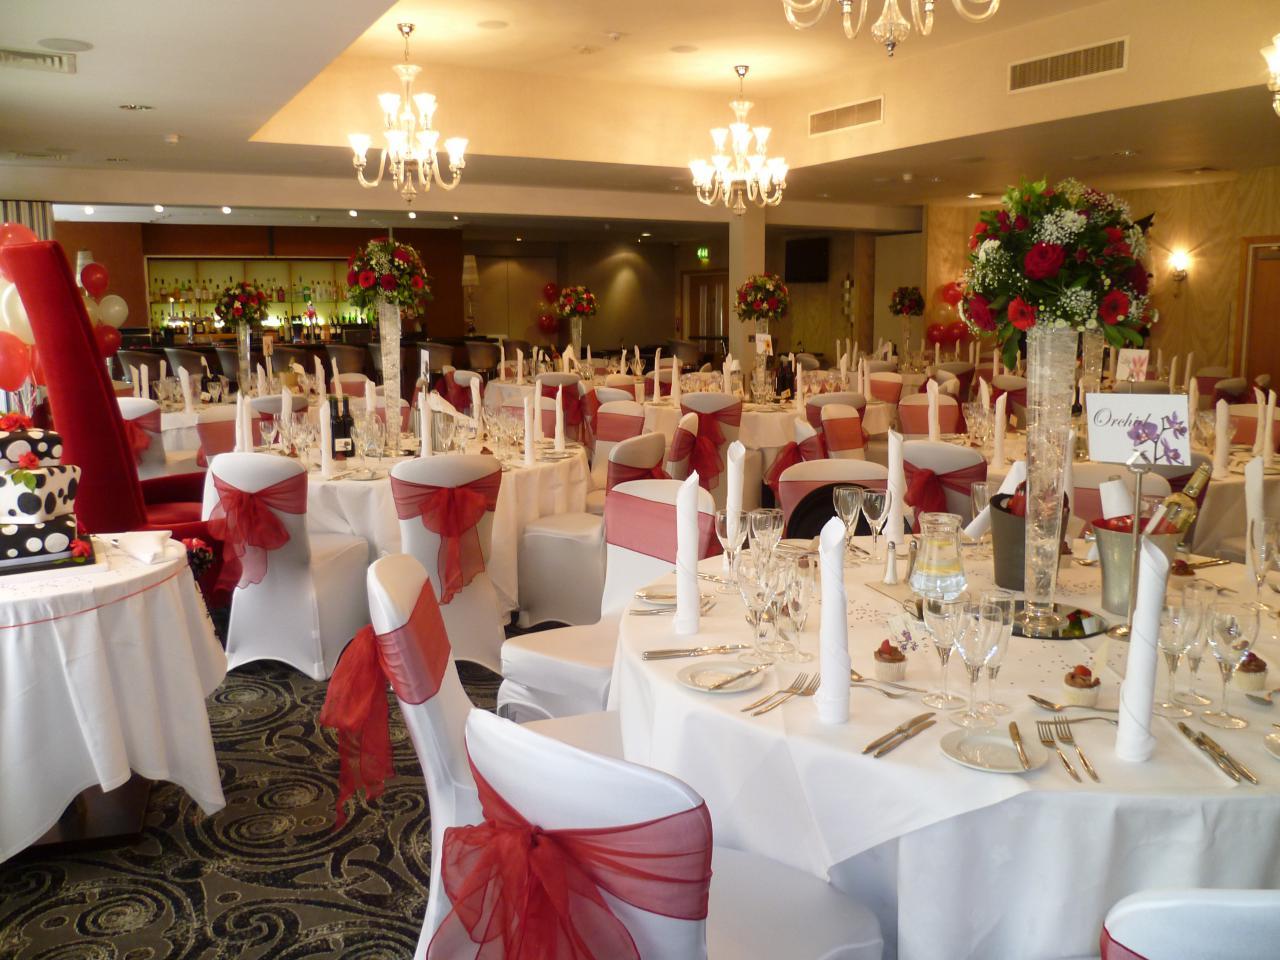 Slough hotel wedding venue gallery the pinewood hotel buckinghamshire red themed wedding junglespirit Gallery